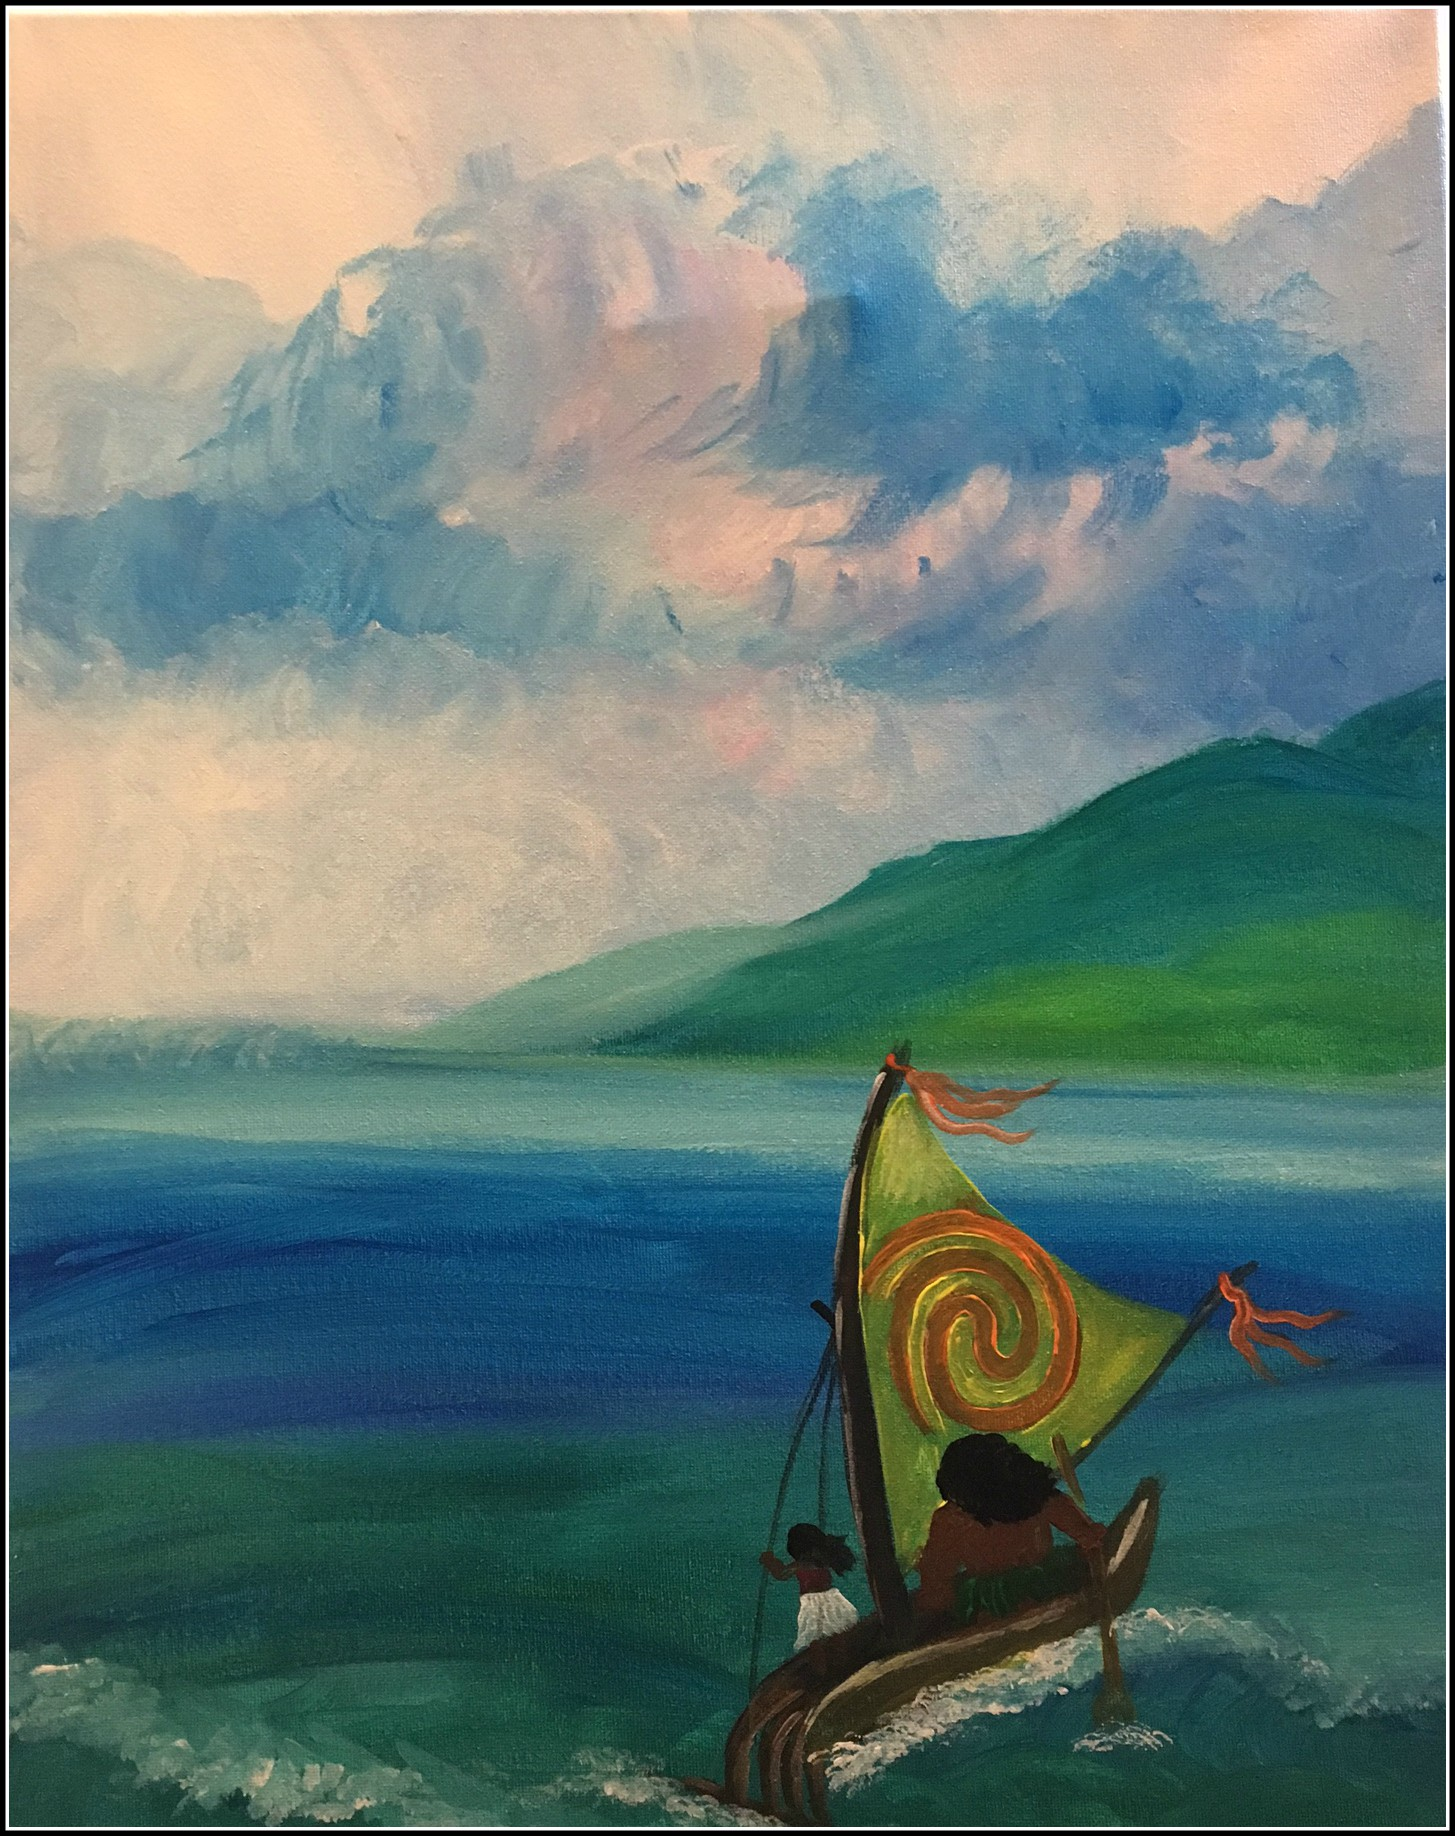 Moana paint & sip painting